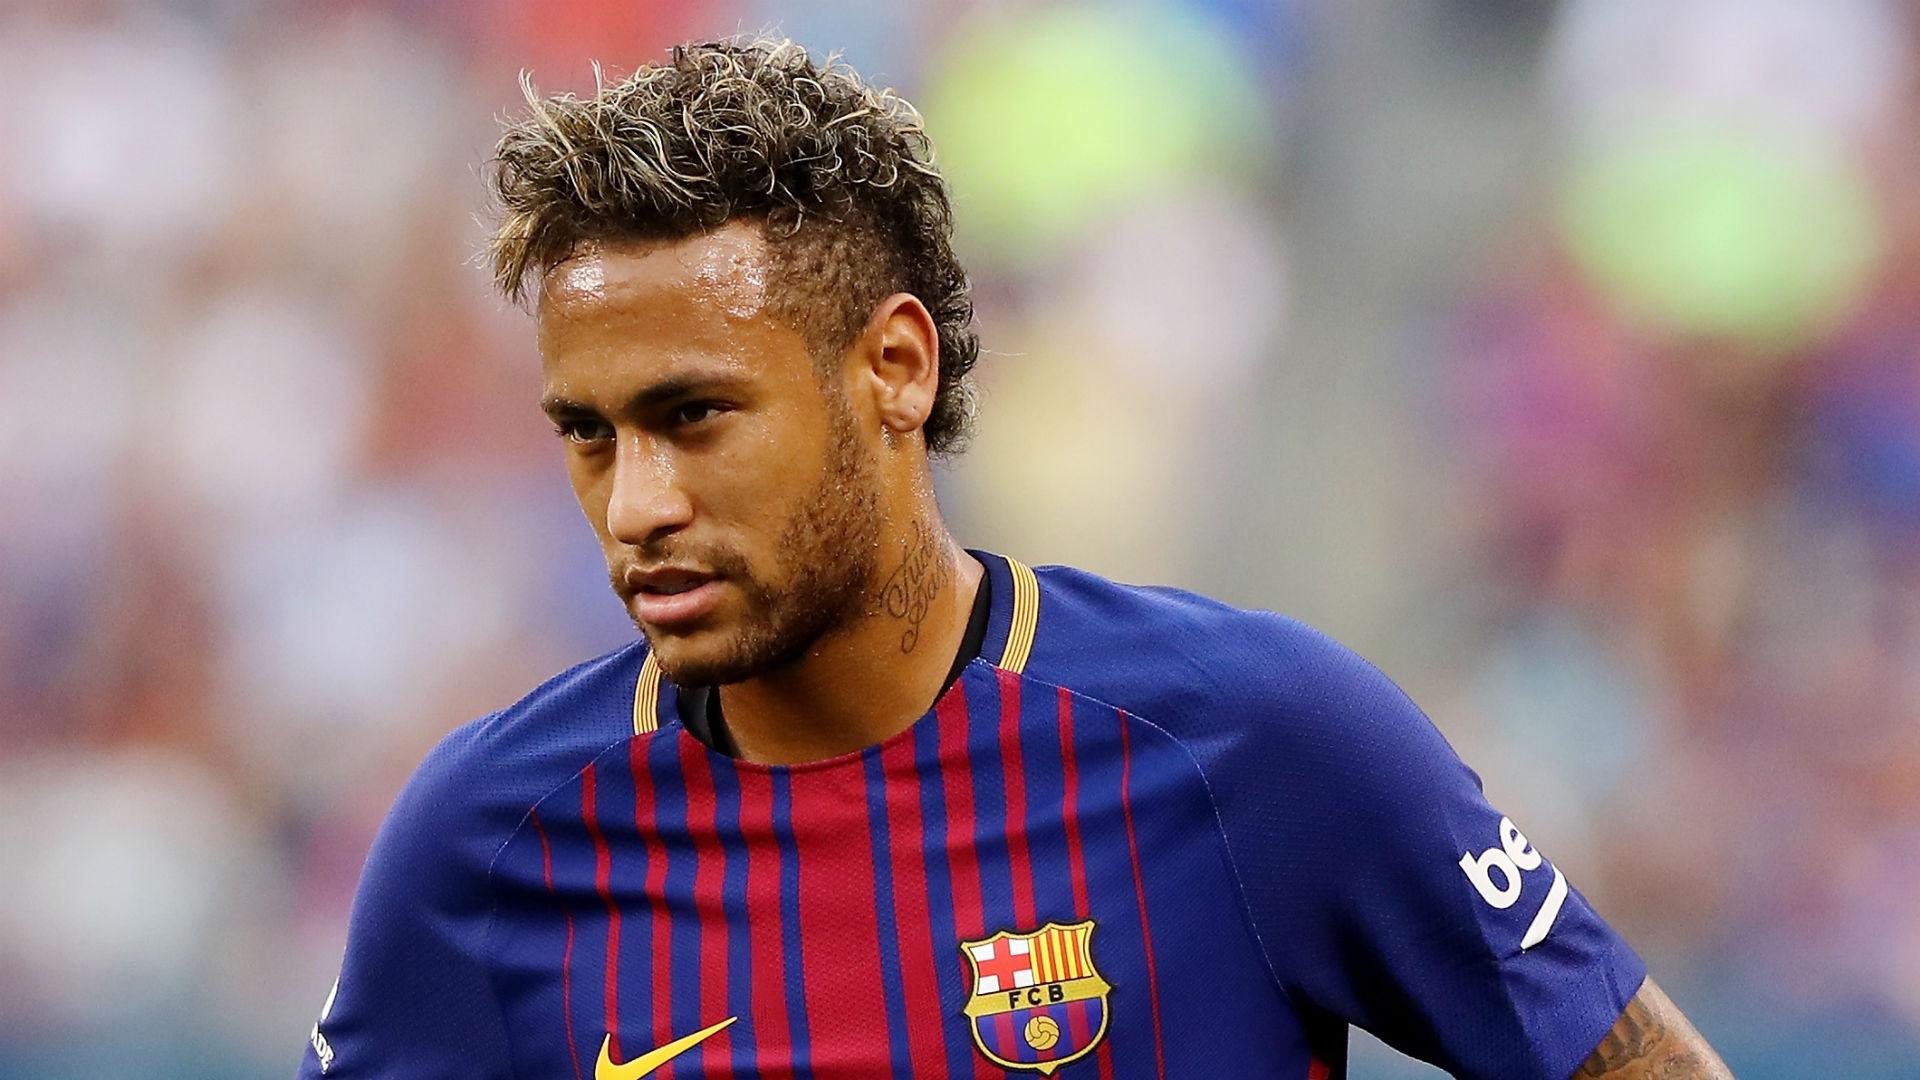 Neymar-barcelona_thd3l8mxa7o1gxhz3wkayiqz